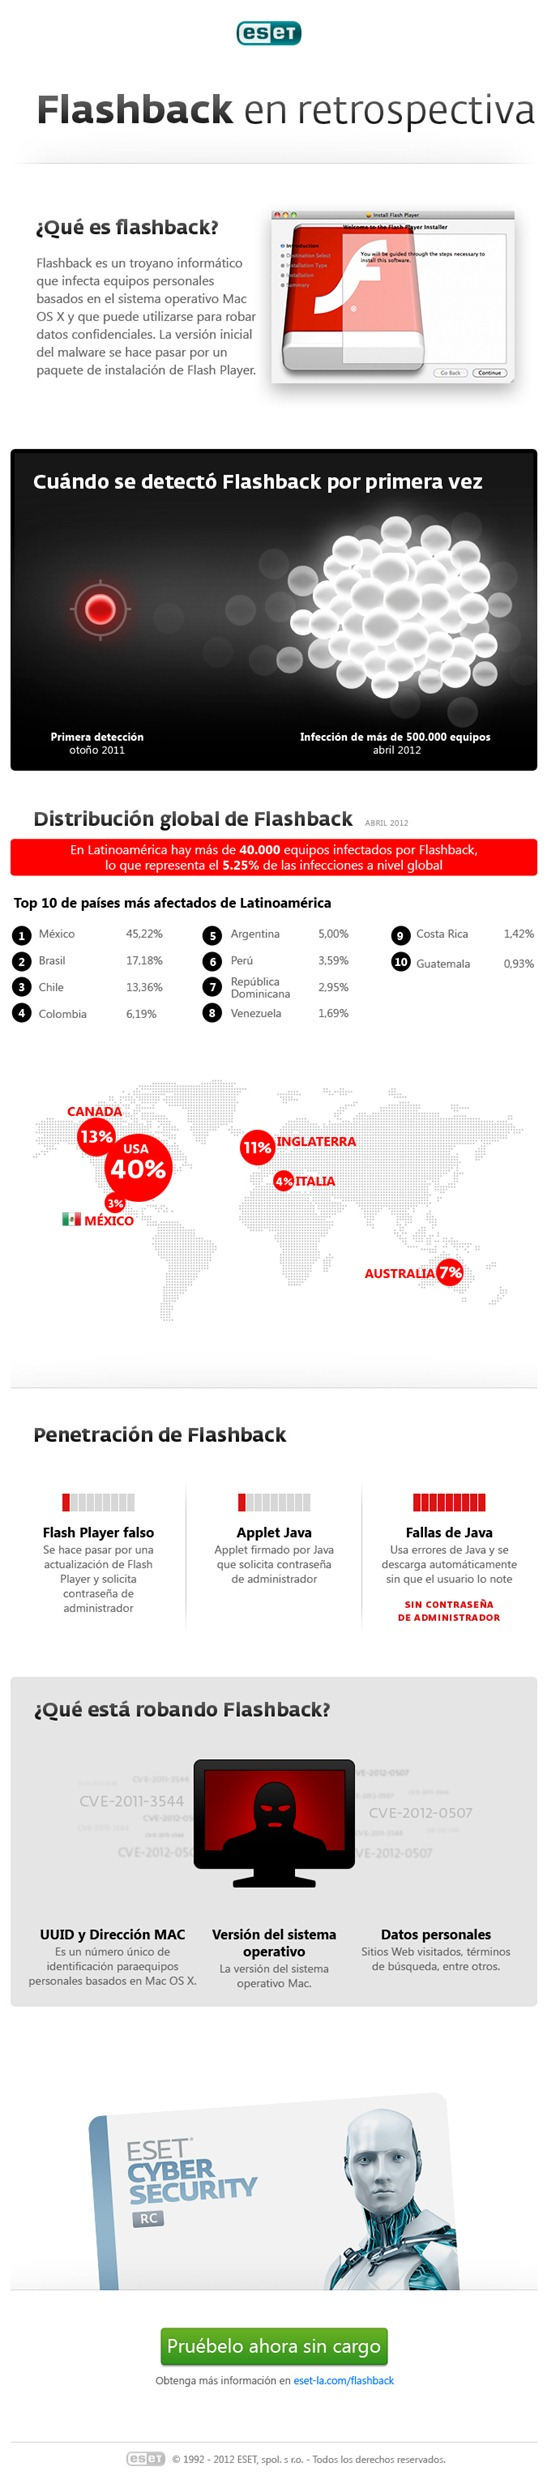 Infografía - Flashback